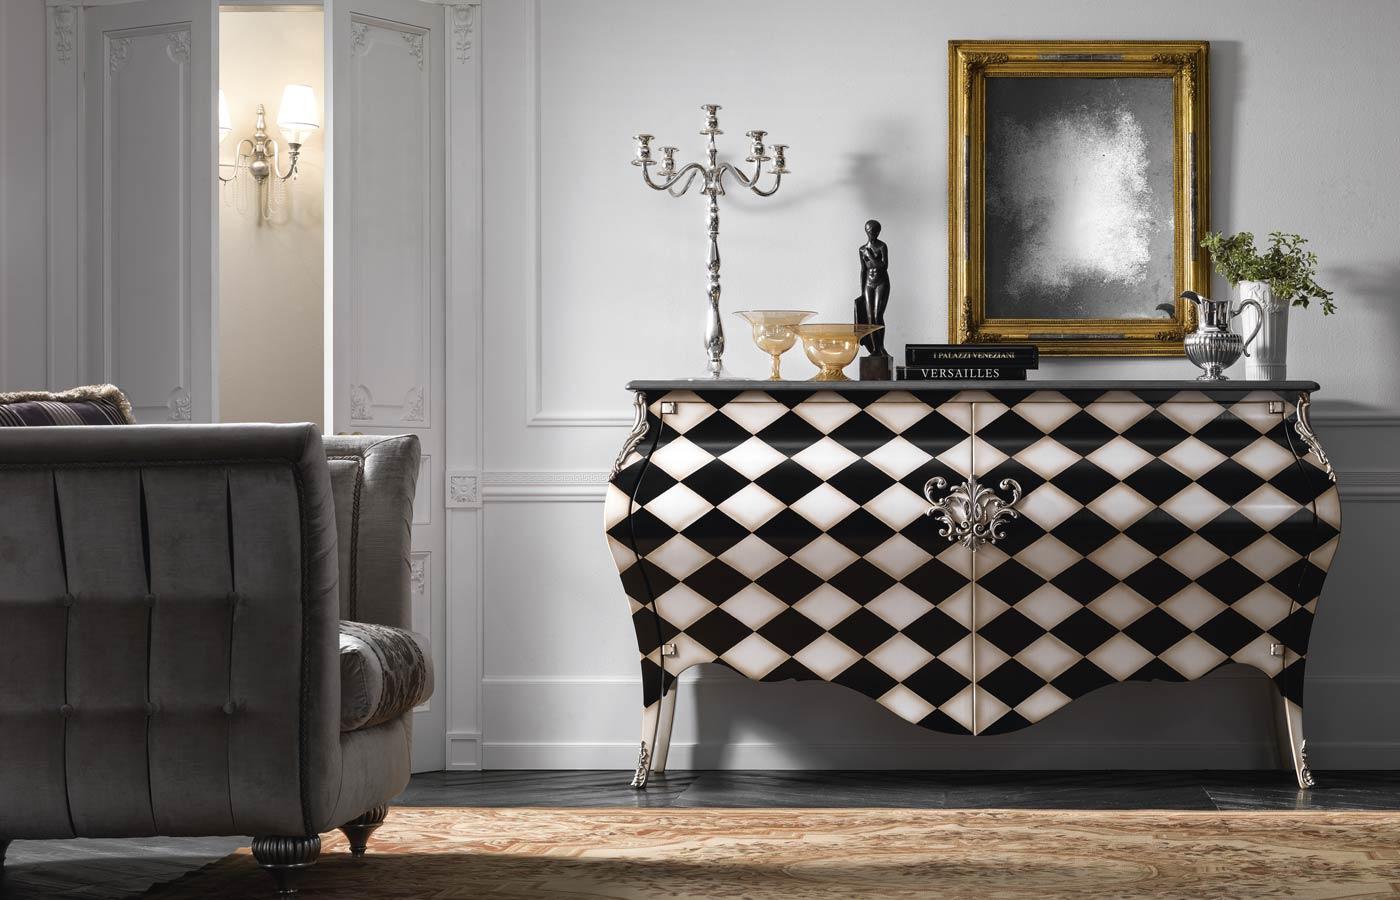 ByElisabethNL: Furniture Design: Elegant Black & White ...